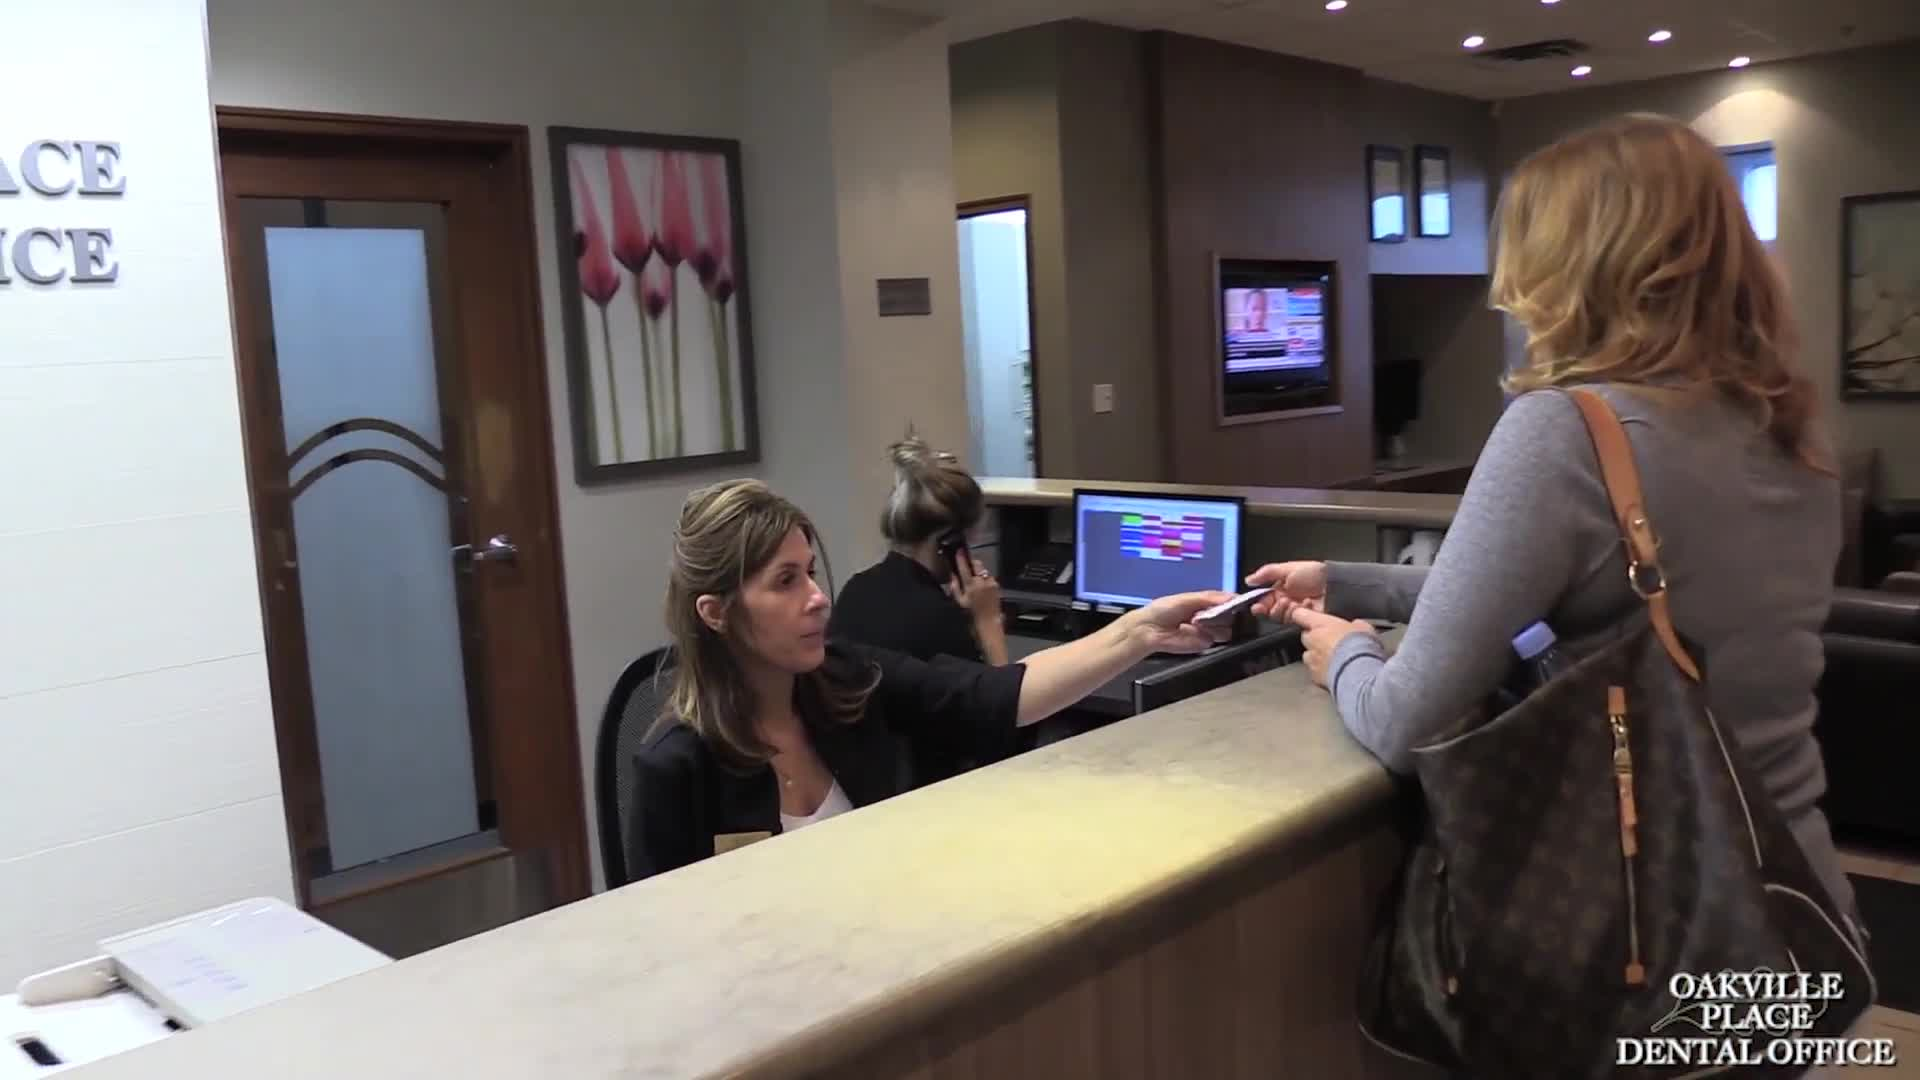 Oakville Place Dental Office - Dentists - 9058426030